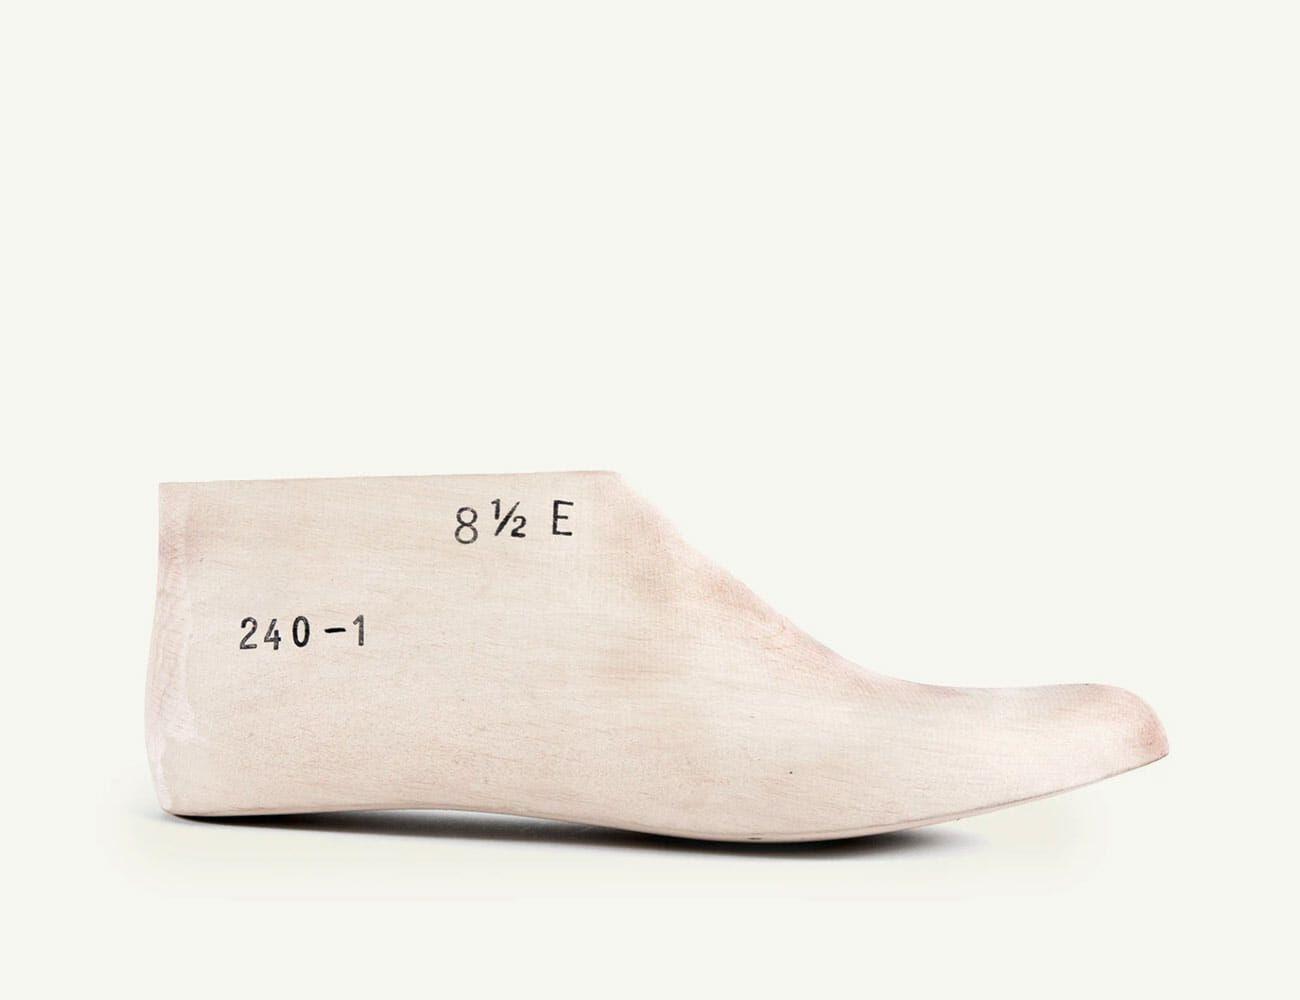 Slick Joker Poker Compression Socks For Women Casual Fashion Crew Socks